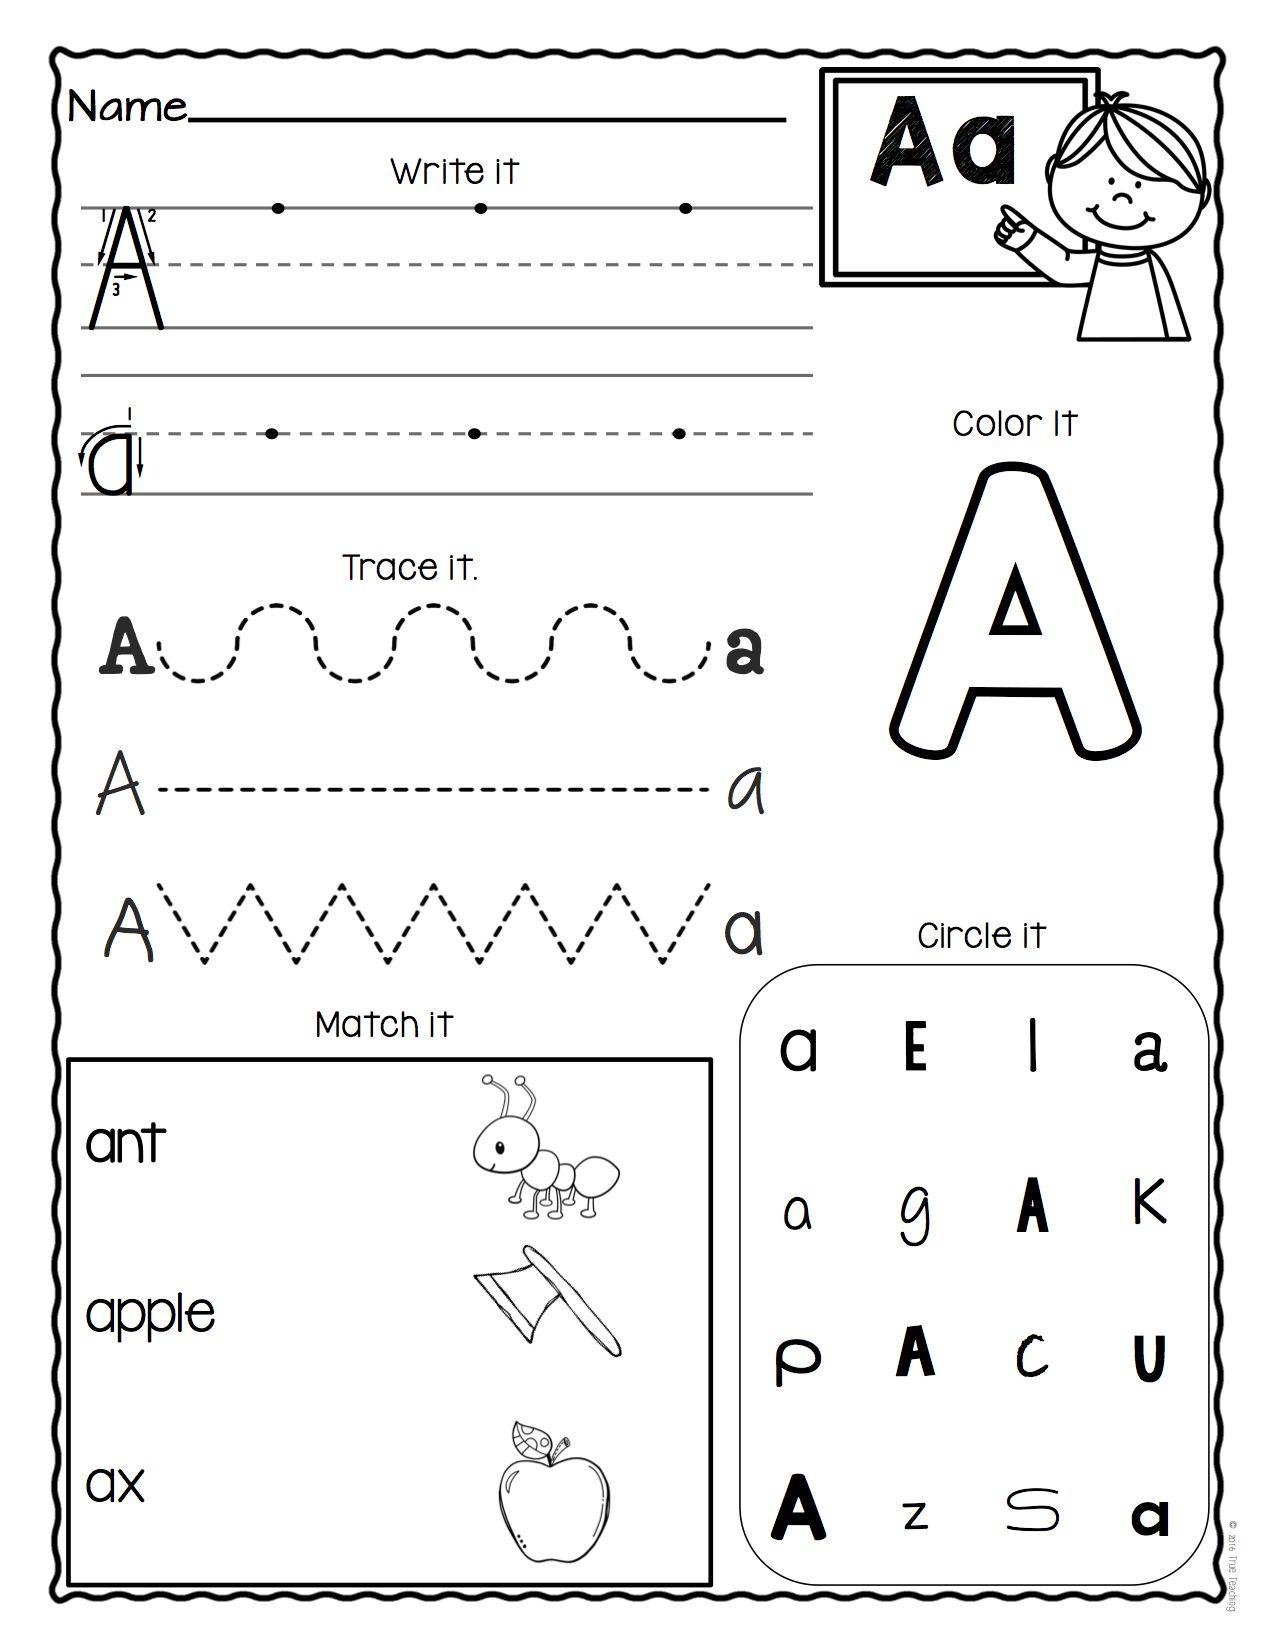 A-Z Letter Worksheets (Set 3) | Preschool Worksheets pertaining to Reading A-Z Alphabet Worksheets